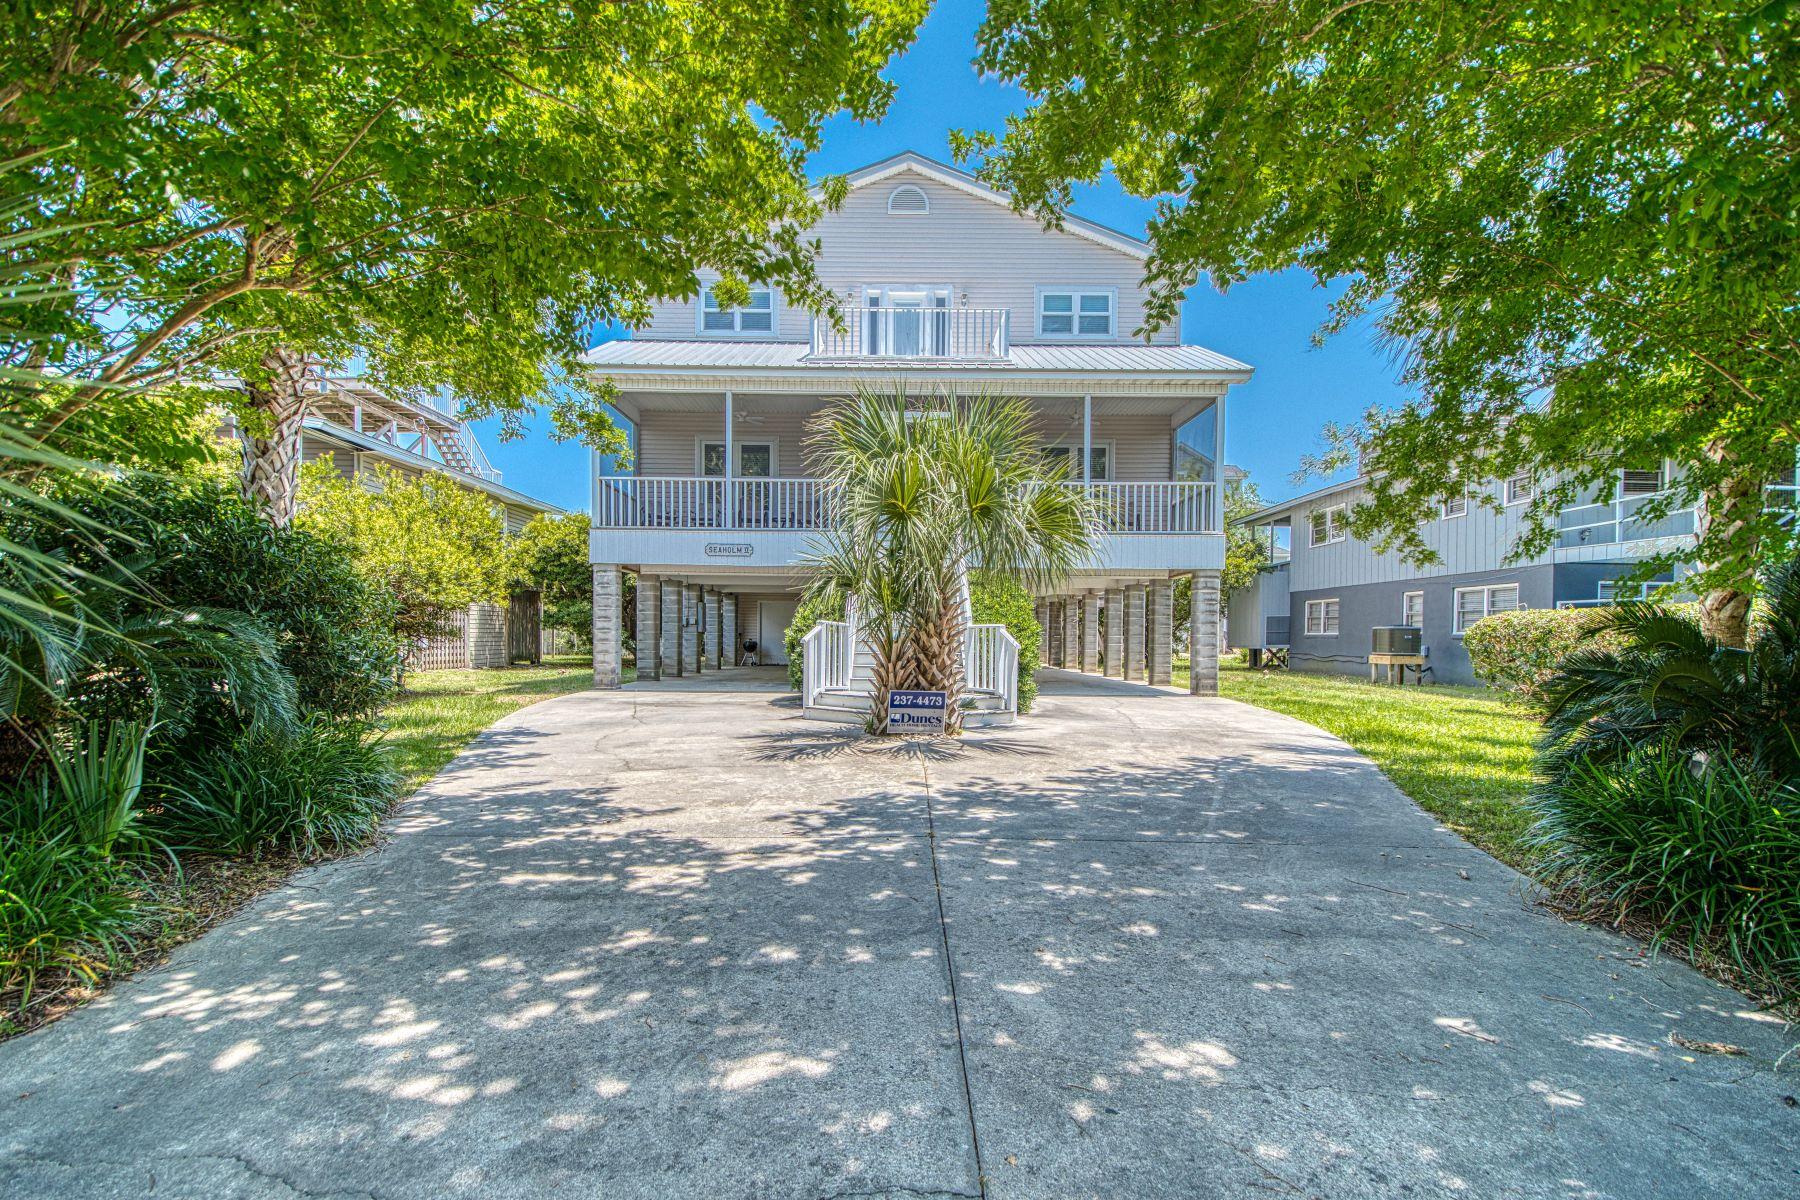 Single Family Homes for Sale at 147 Sundial Drive Pawleys Island, South Carolina 29585 United States